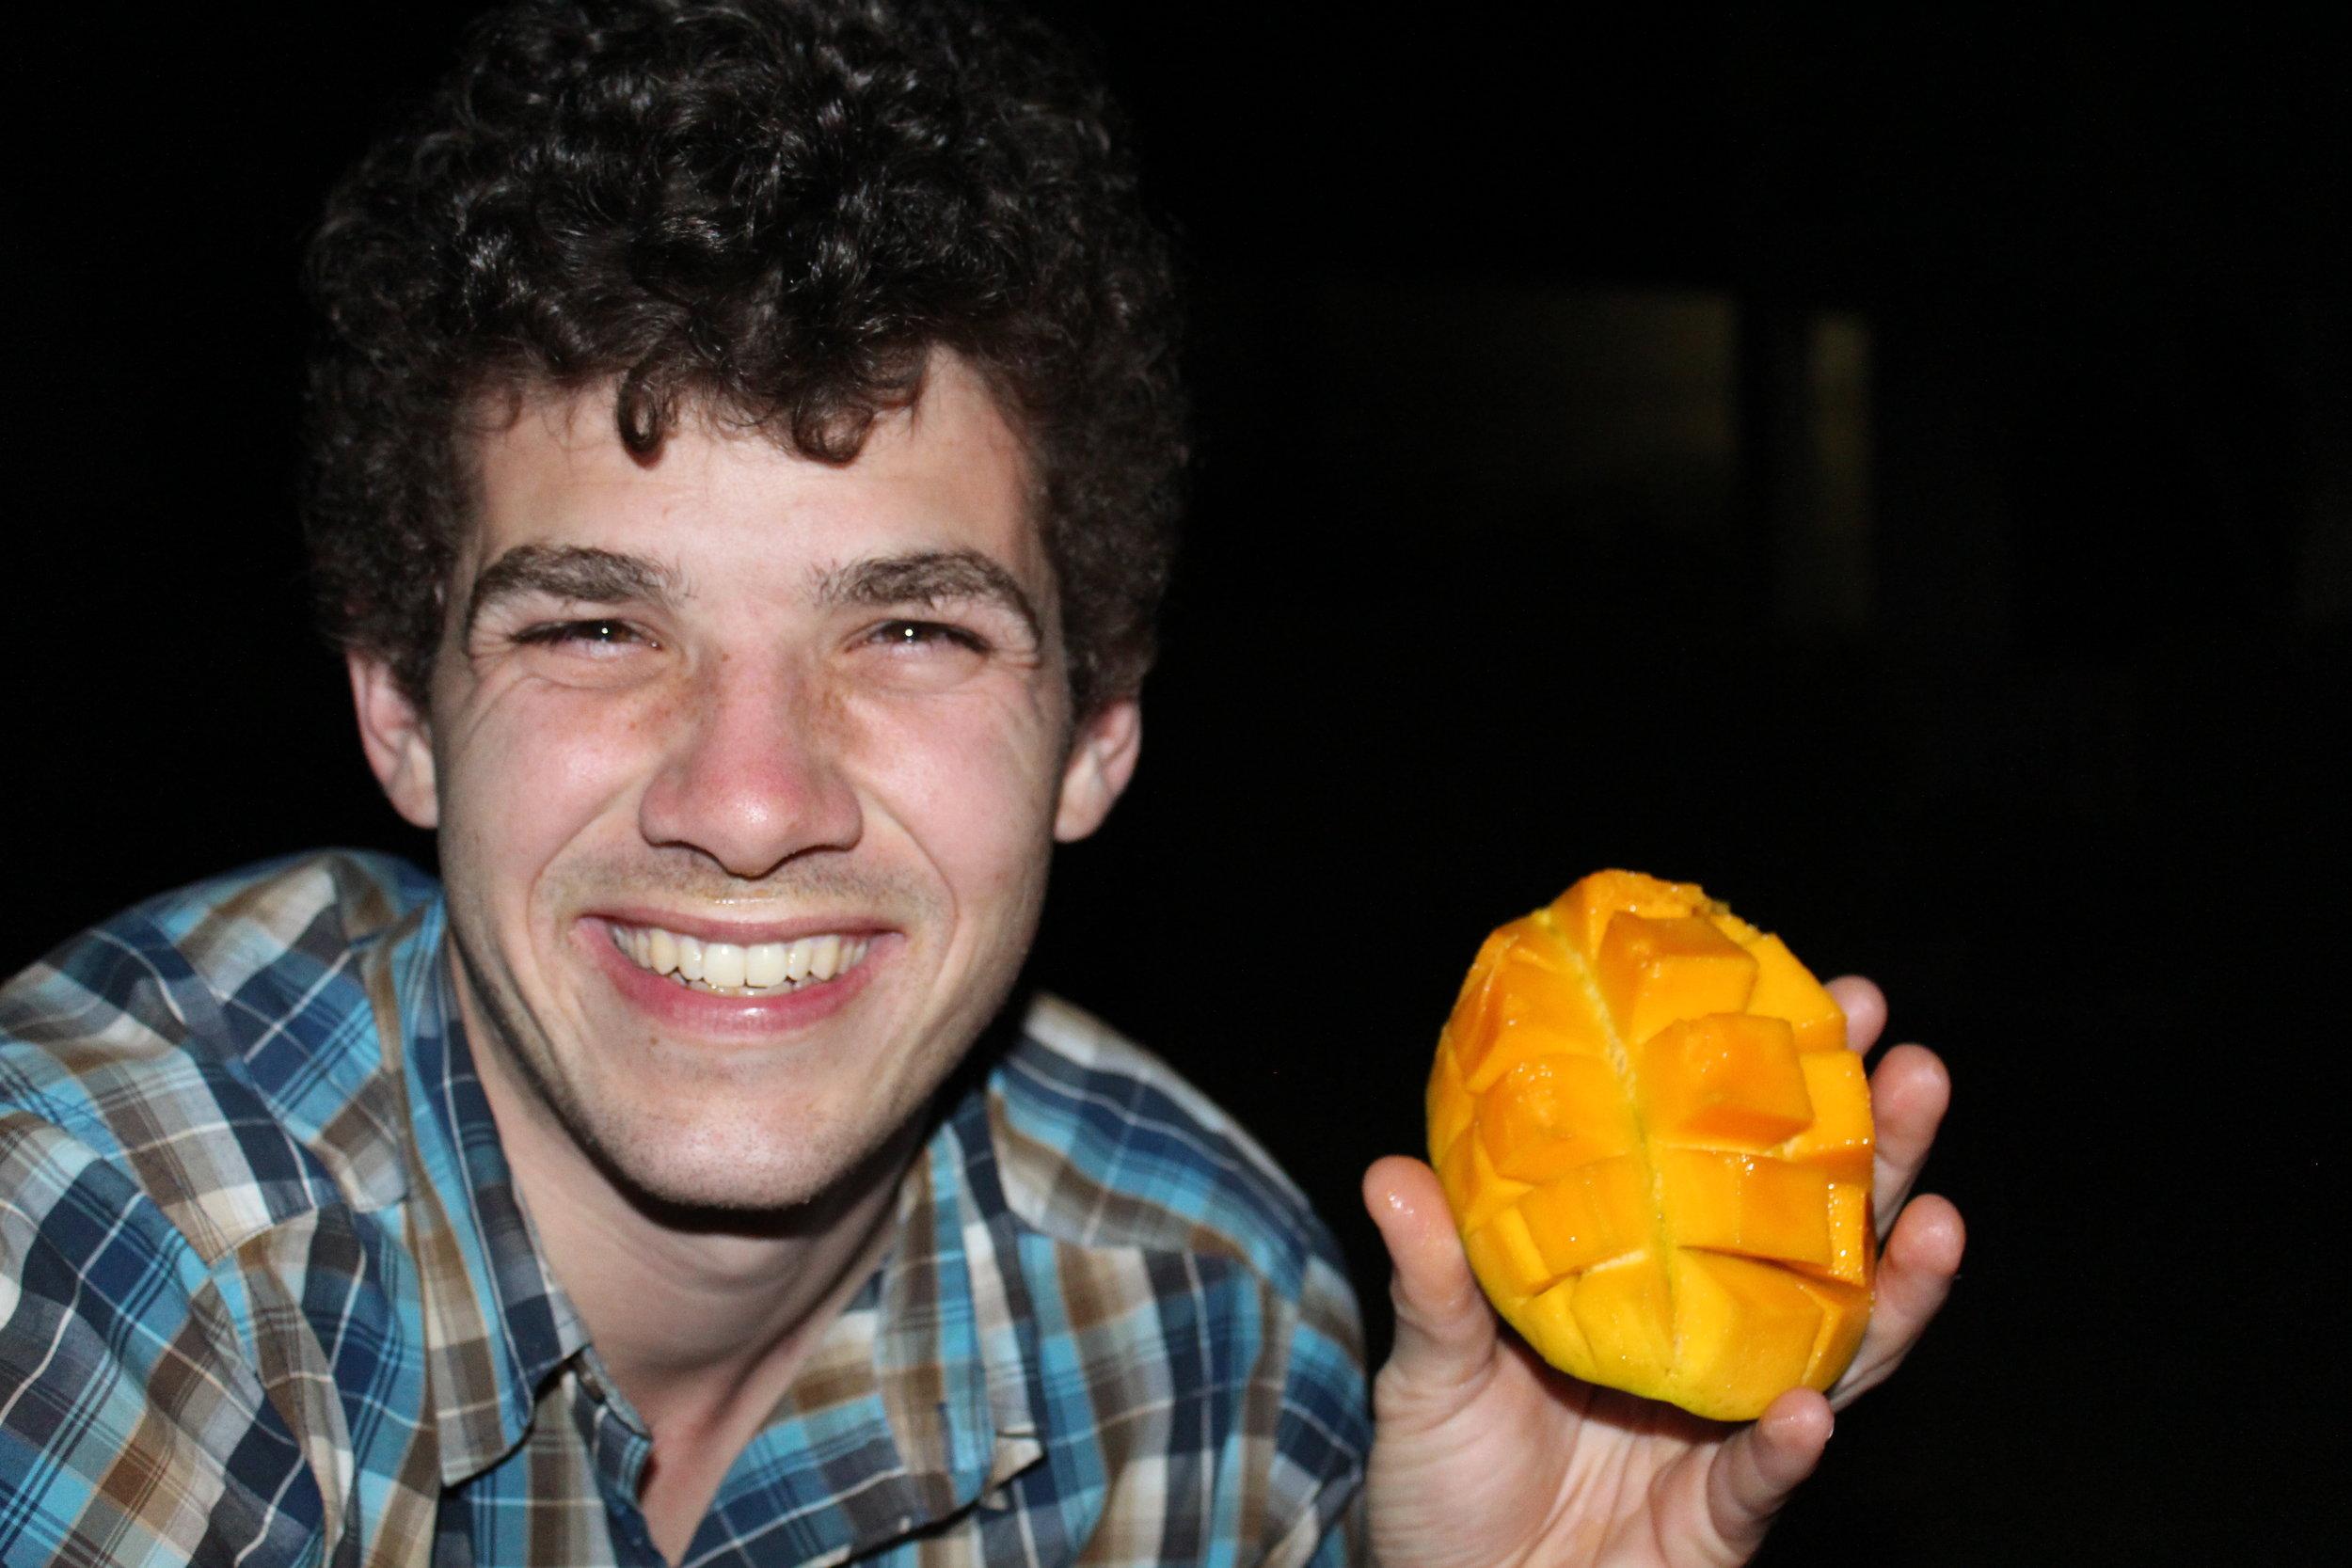 Eating our fresh mango!